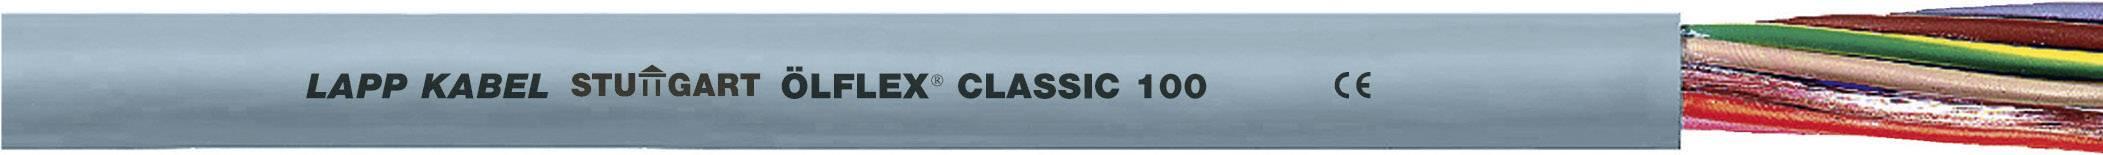 Kabel LappKabel Ölflex CLASSIC 100 3G70 (0010306), PVC, 35,3 mm, 750 V, šedá, 100 m